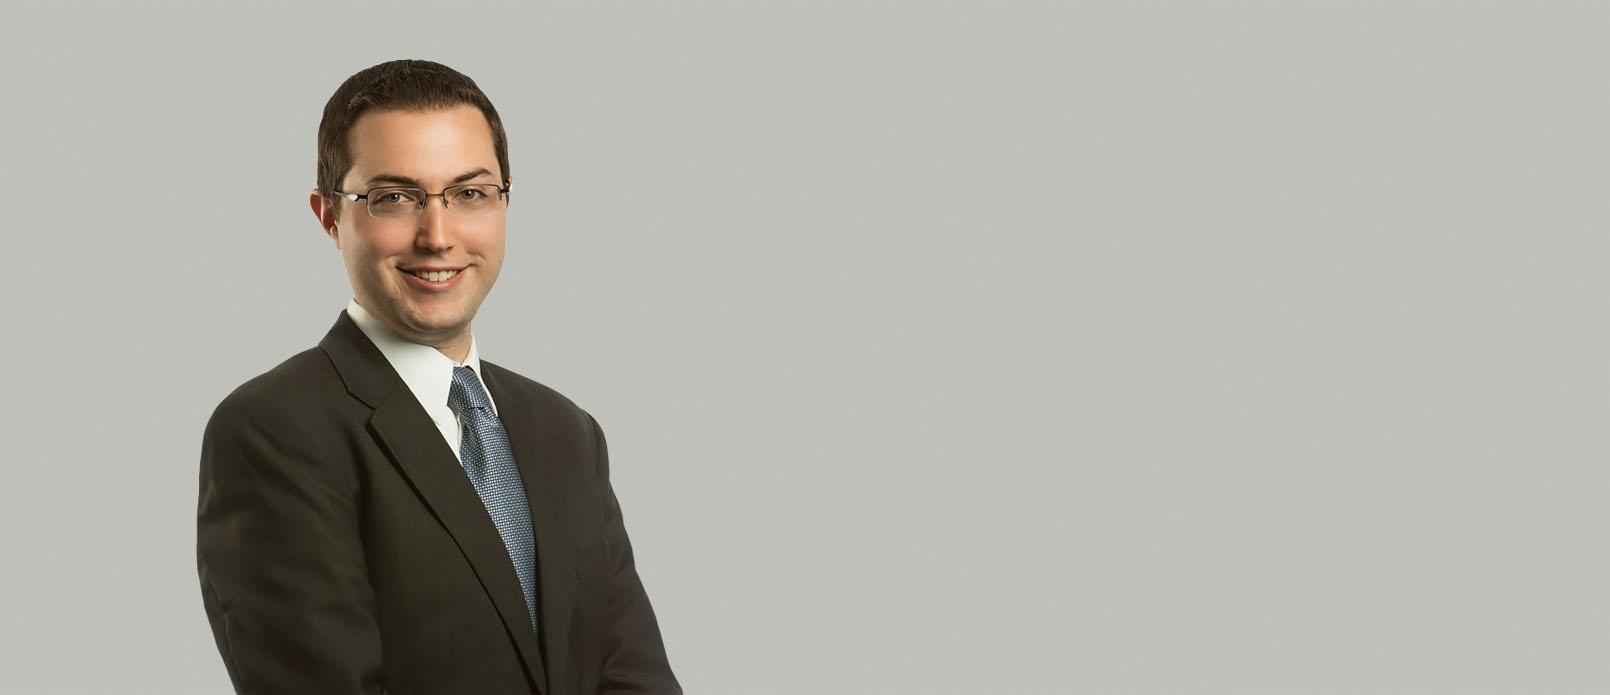 Nicolas P. Cejas